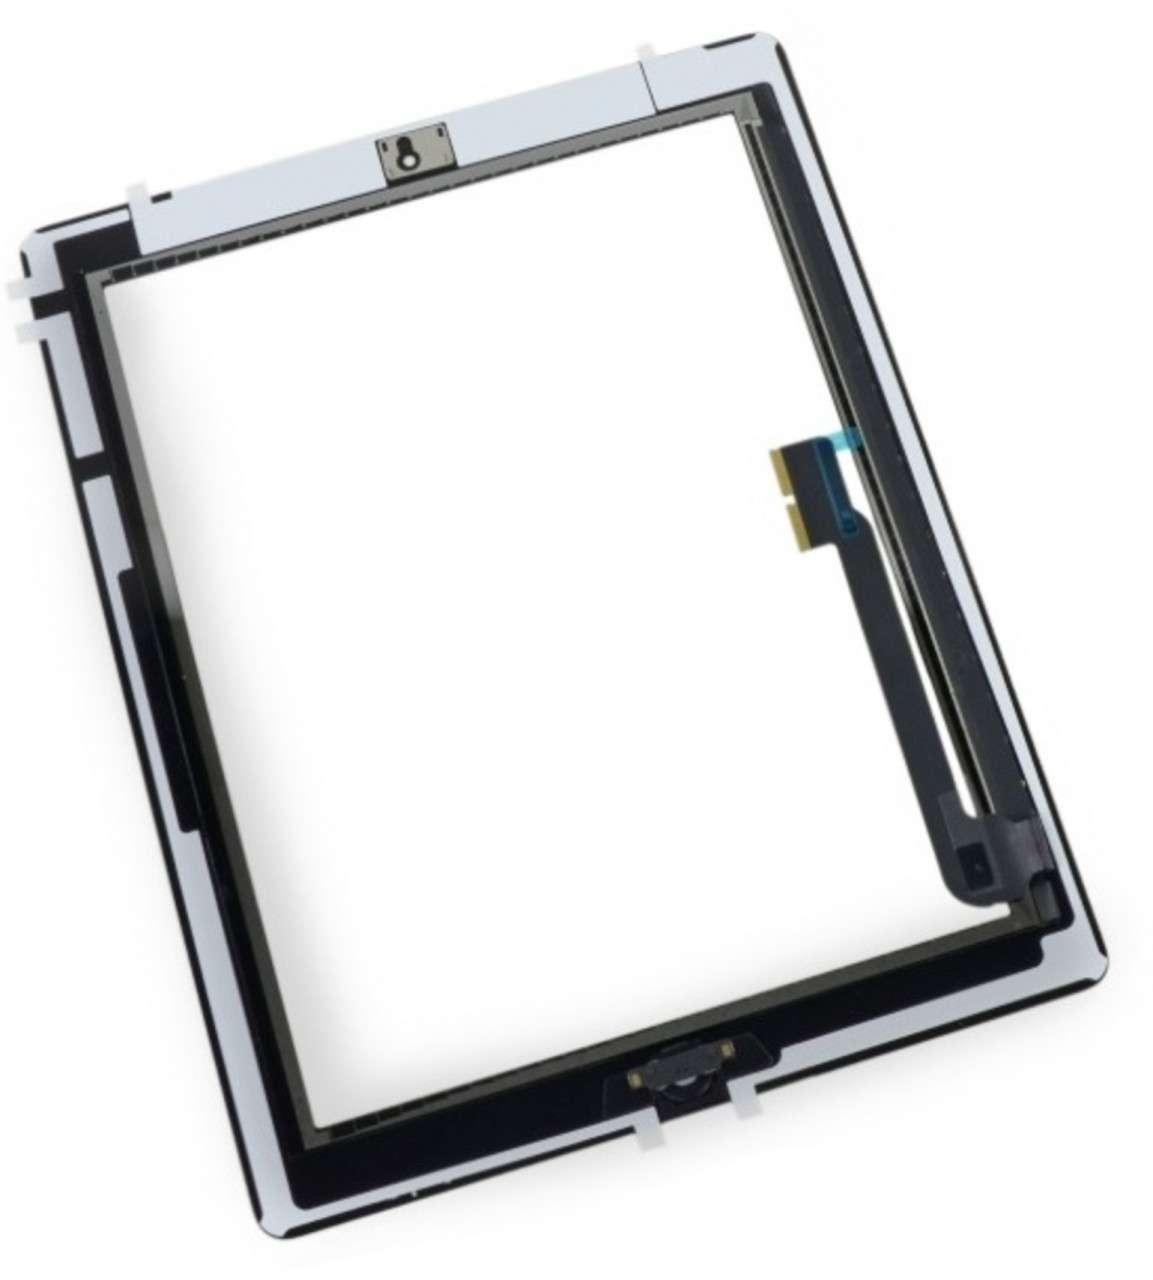 Touchscreen Digitizer Apple iPad 3 A1430 A1416 cu buton home si adeziv Alb Geam Sticla Tableta imagine